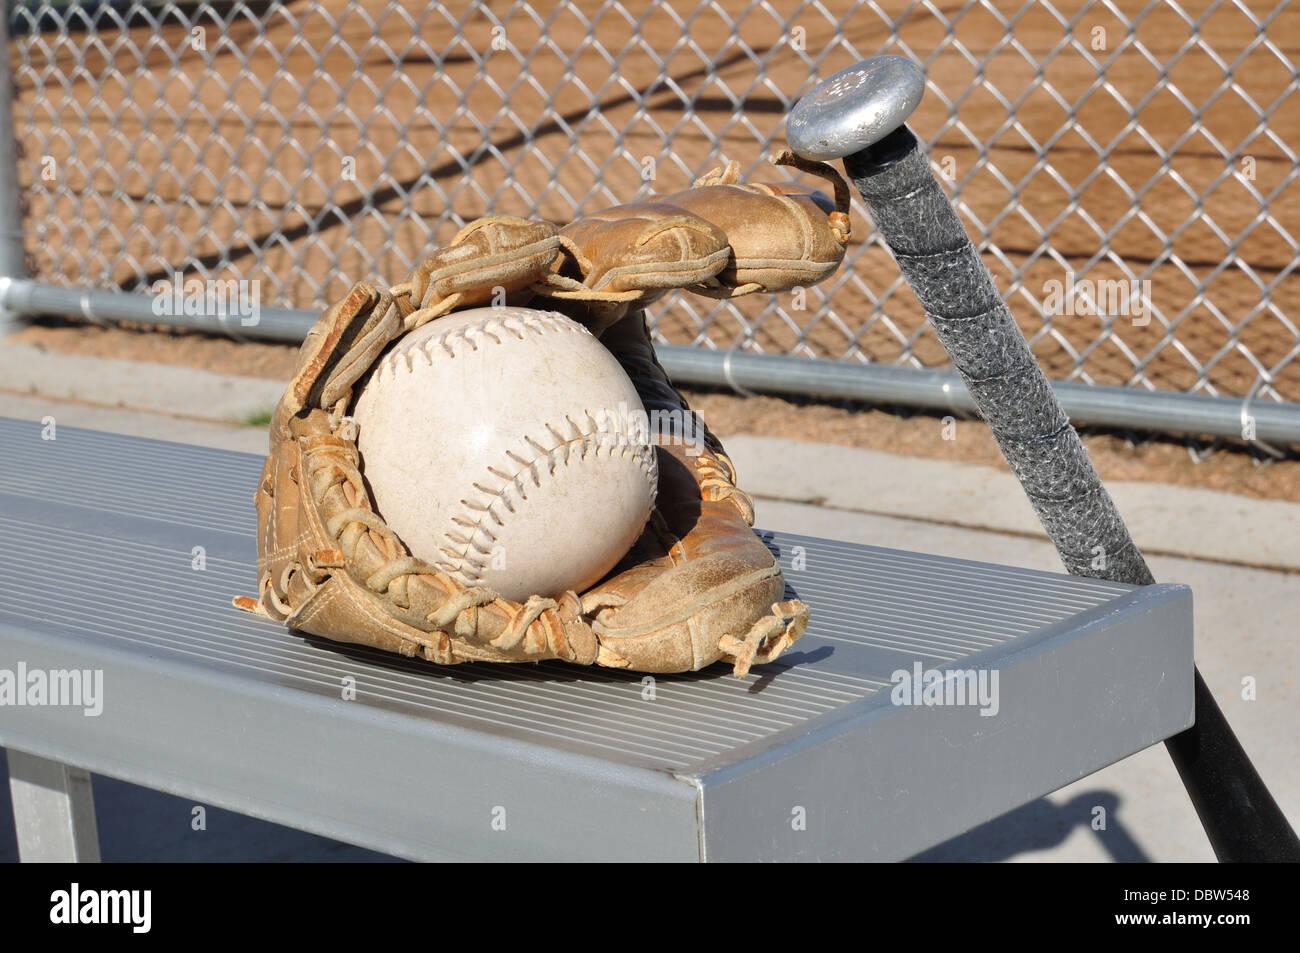 Baseball bat and glove - Stock Image